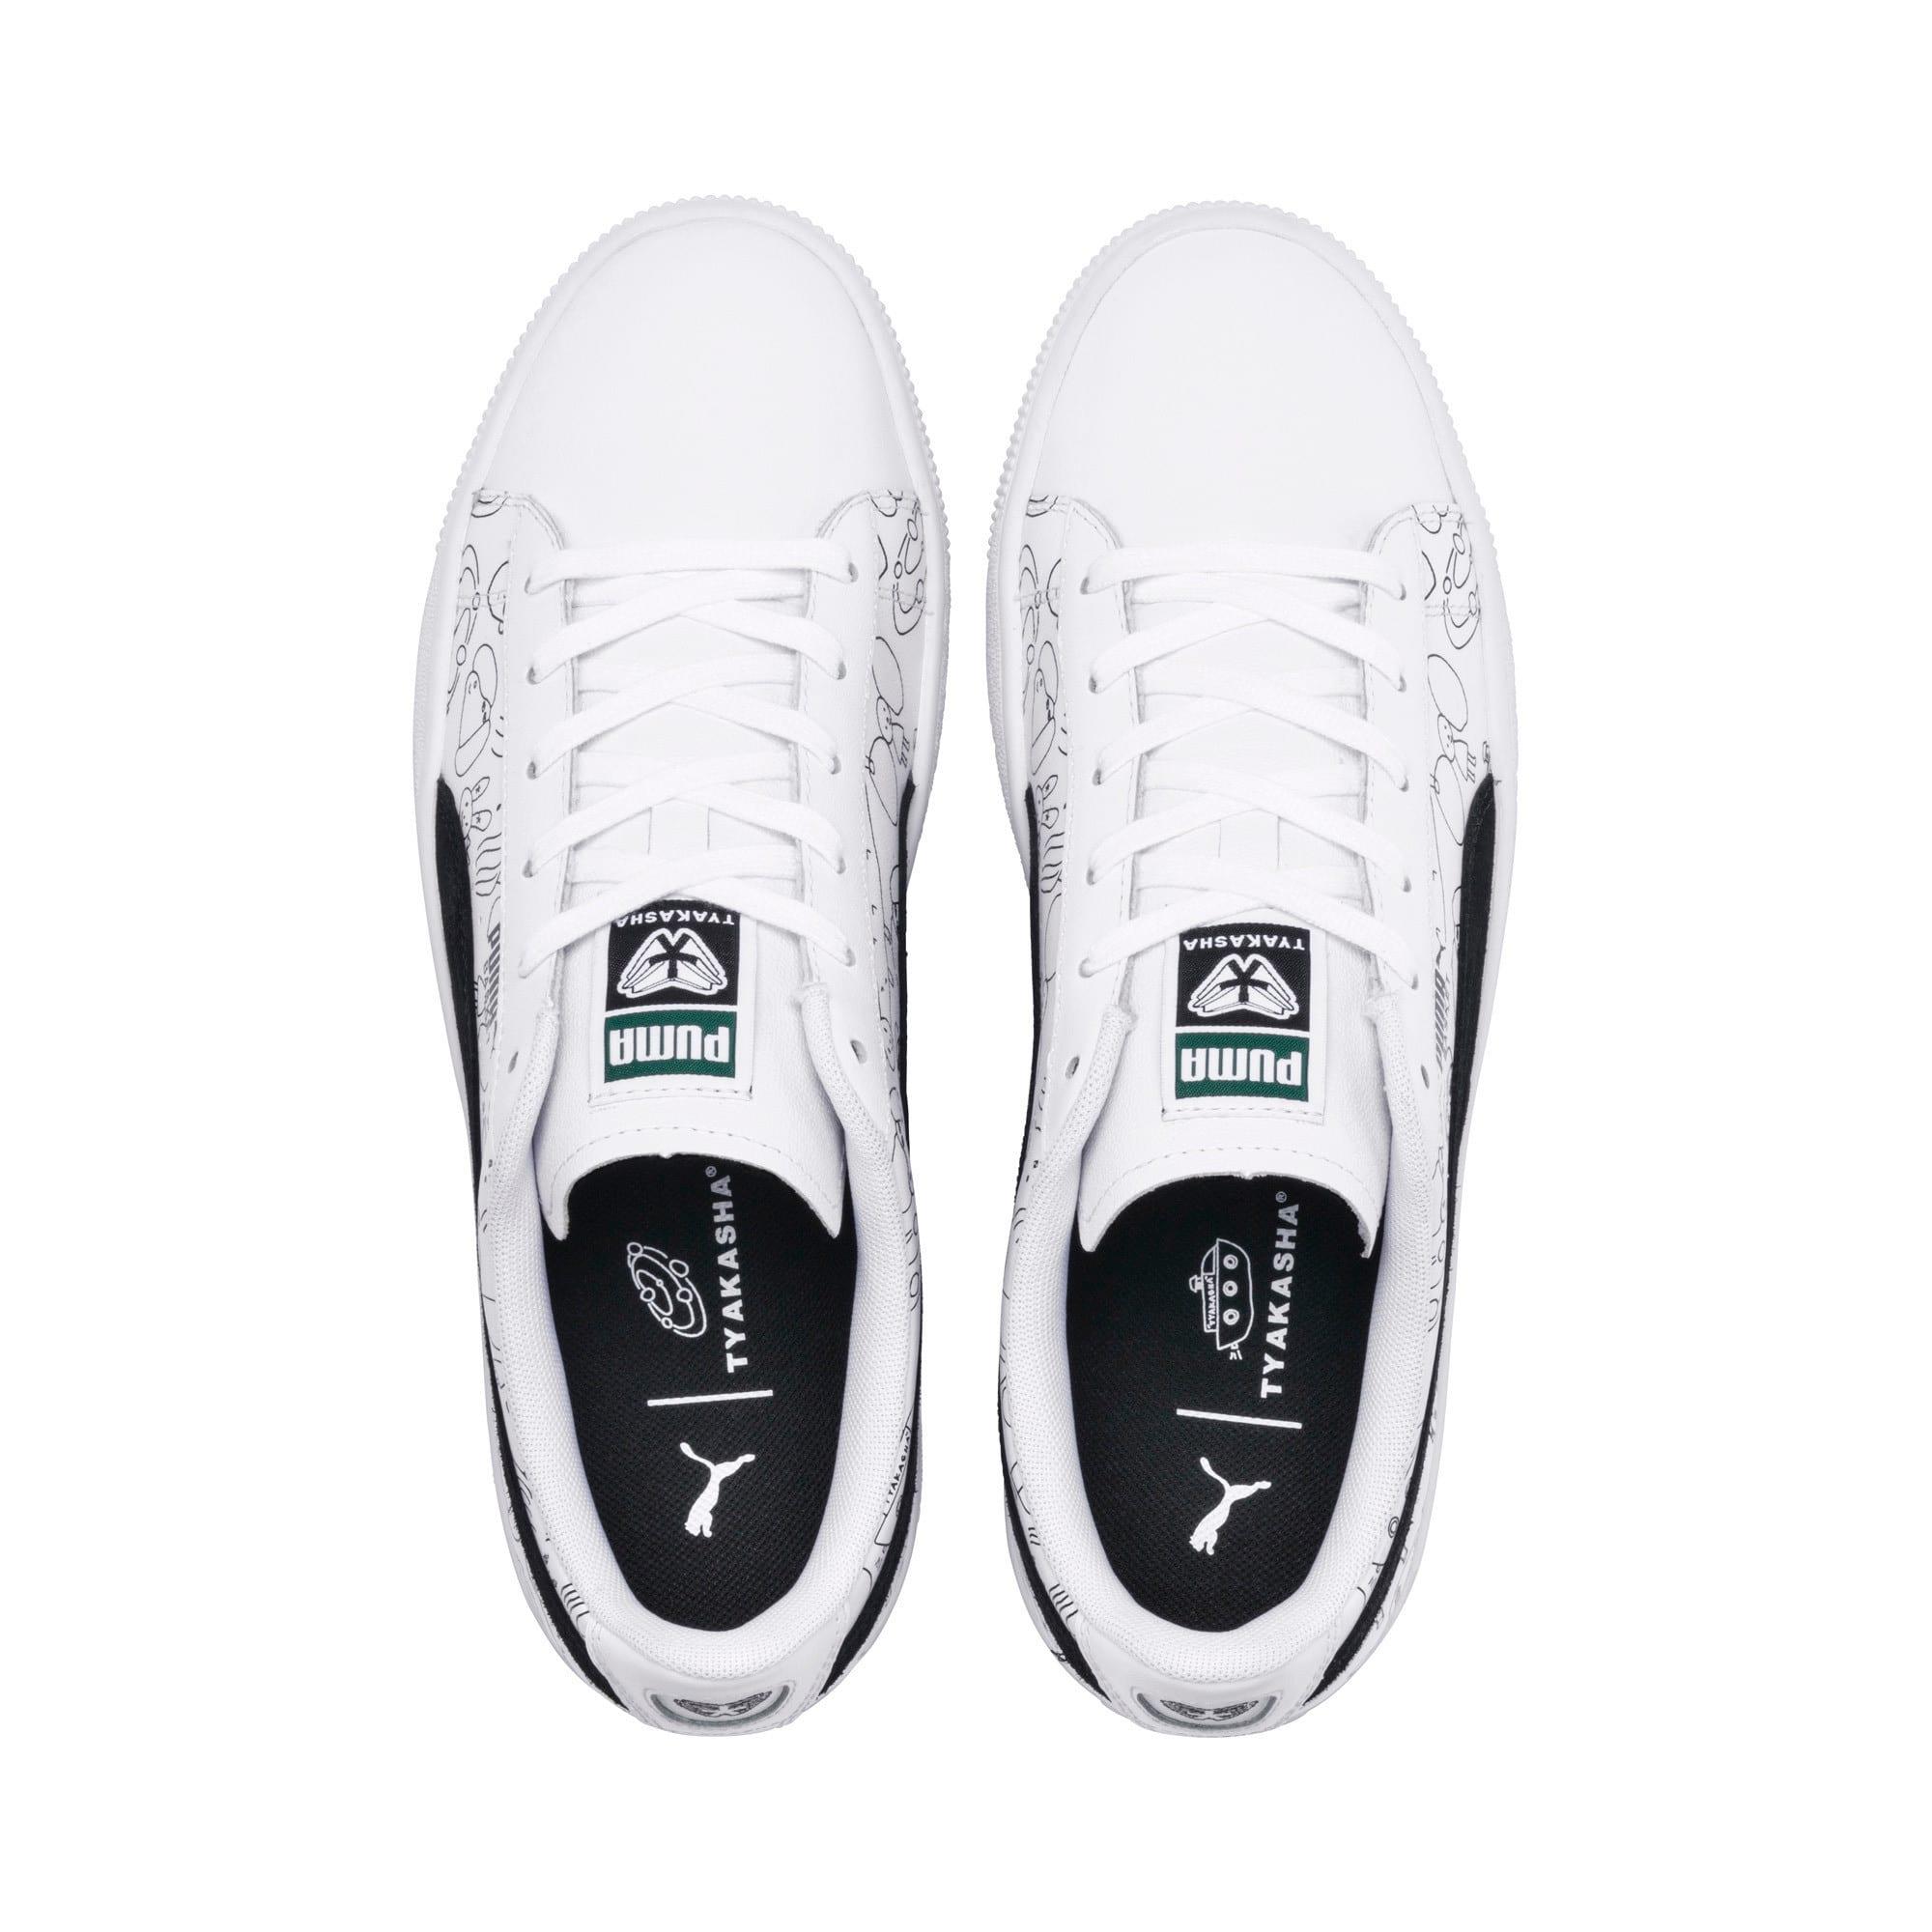 Thumbnail 8 of PUMA x TYAKASHA Basket Sneakers, Puma White-Puma Black, medium